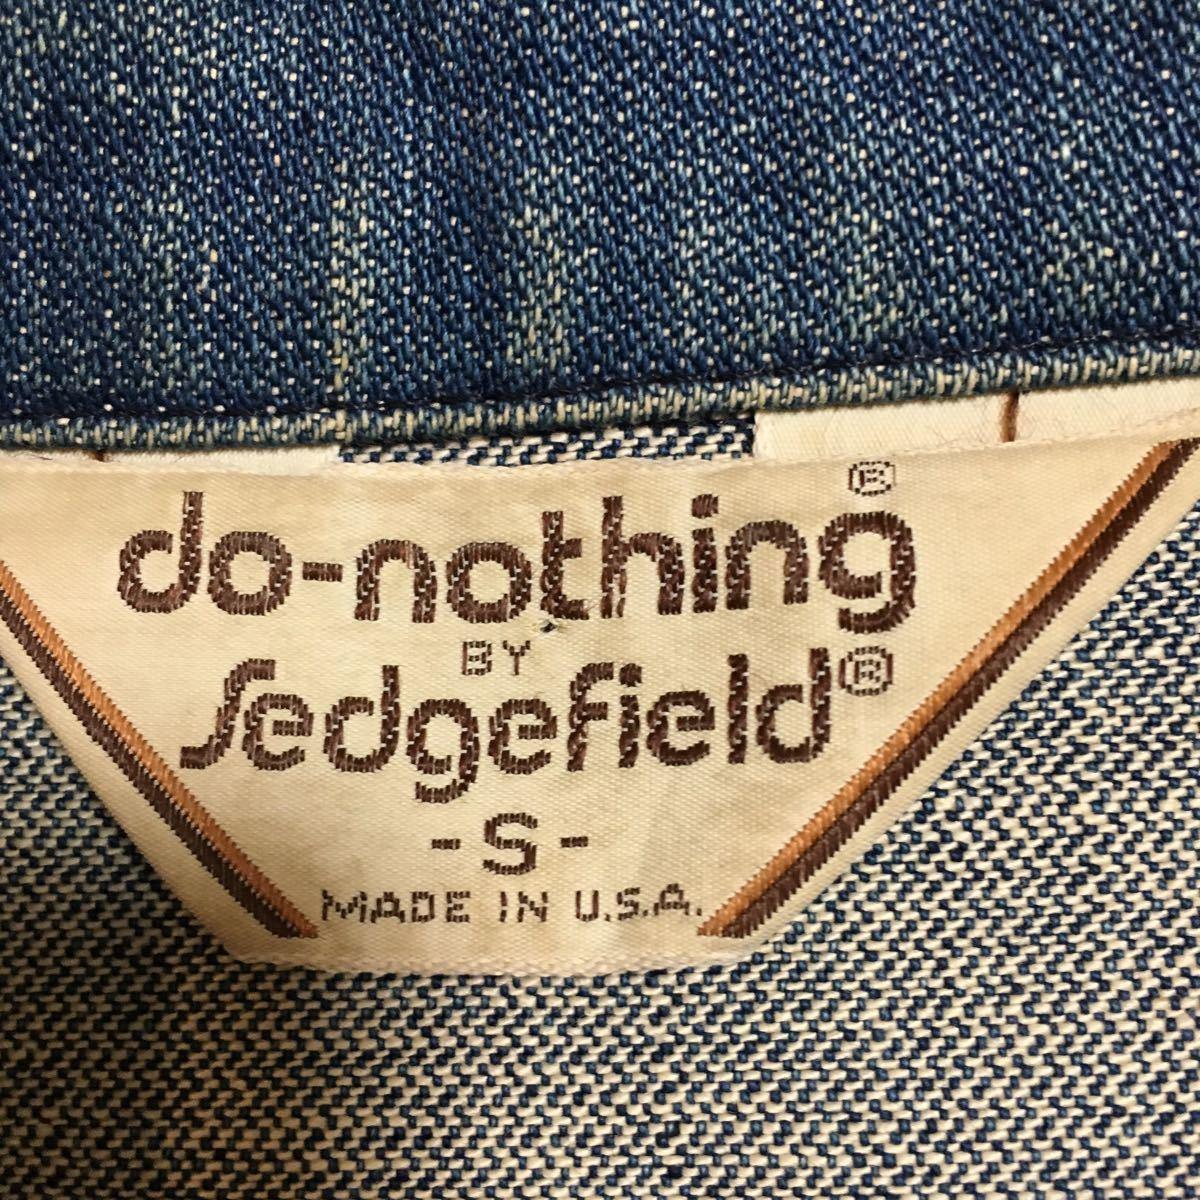 70s USA製 SEDGEFIELD DO-NOTHING デニムジャケット ウエスタンシャツ Sサイズ 古着 ヴィンテージ _画像2